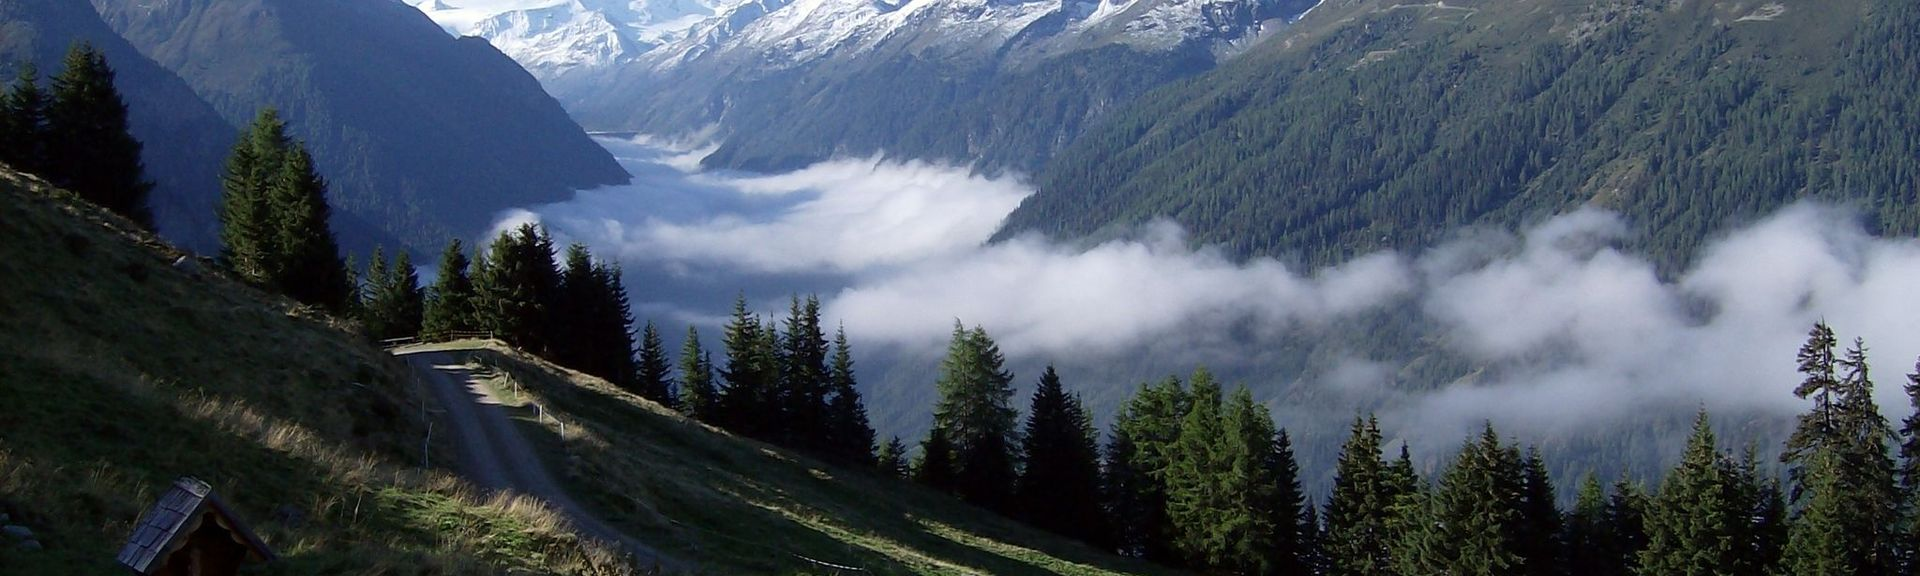 Pettneu am Arlberg, Tyrol, Áustria